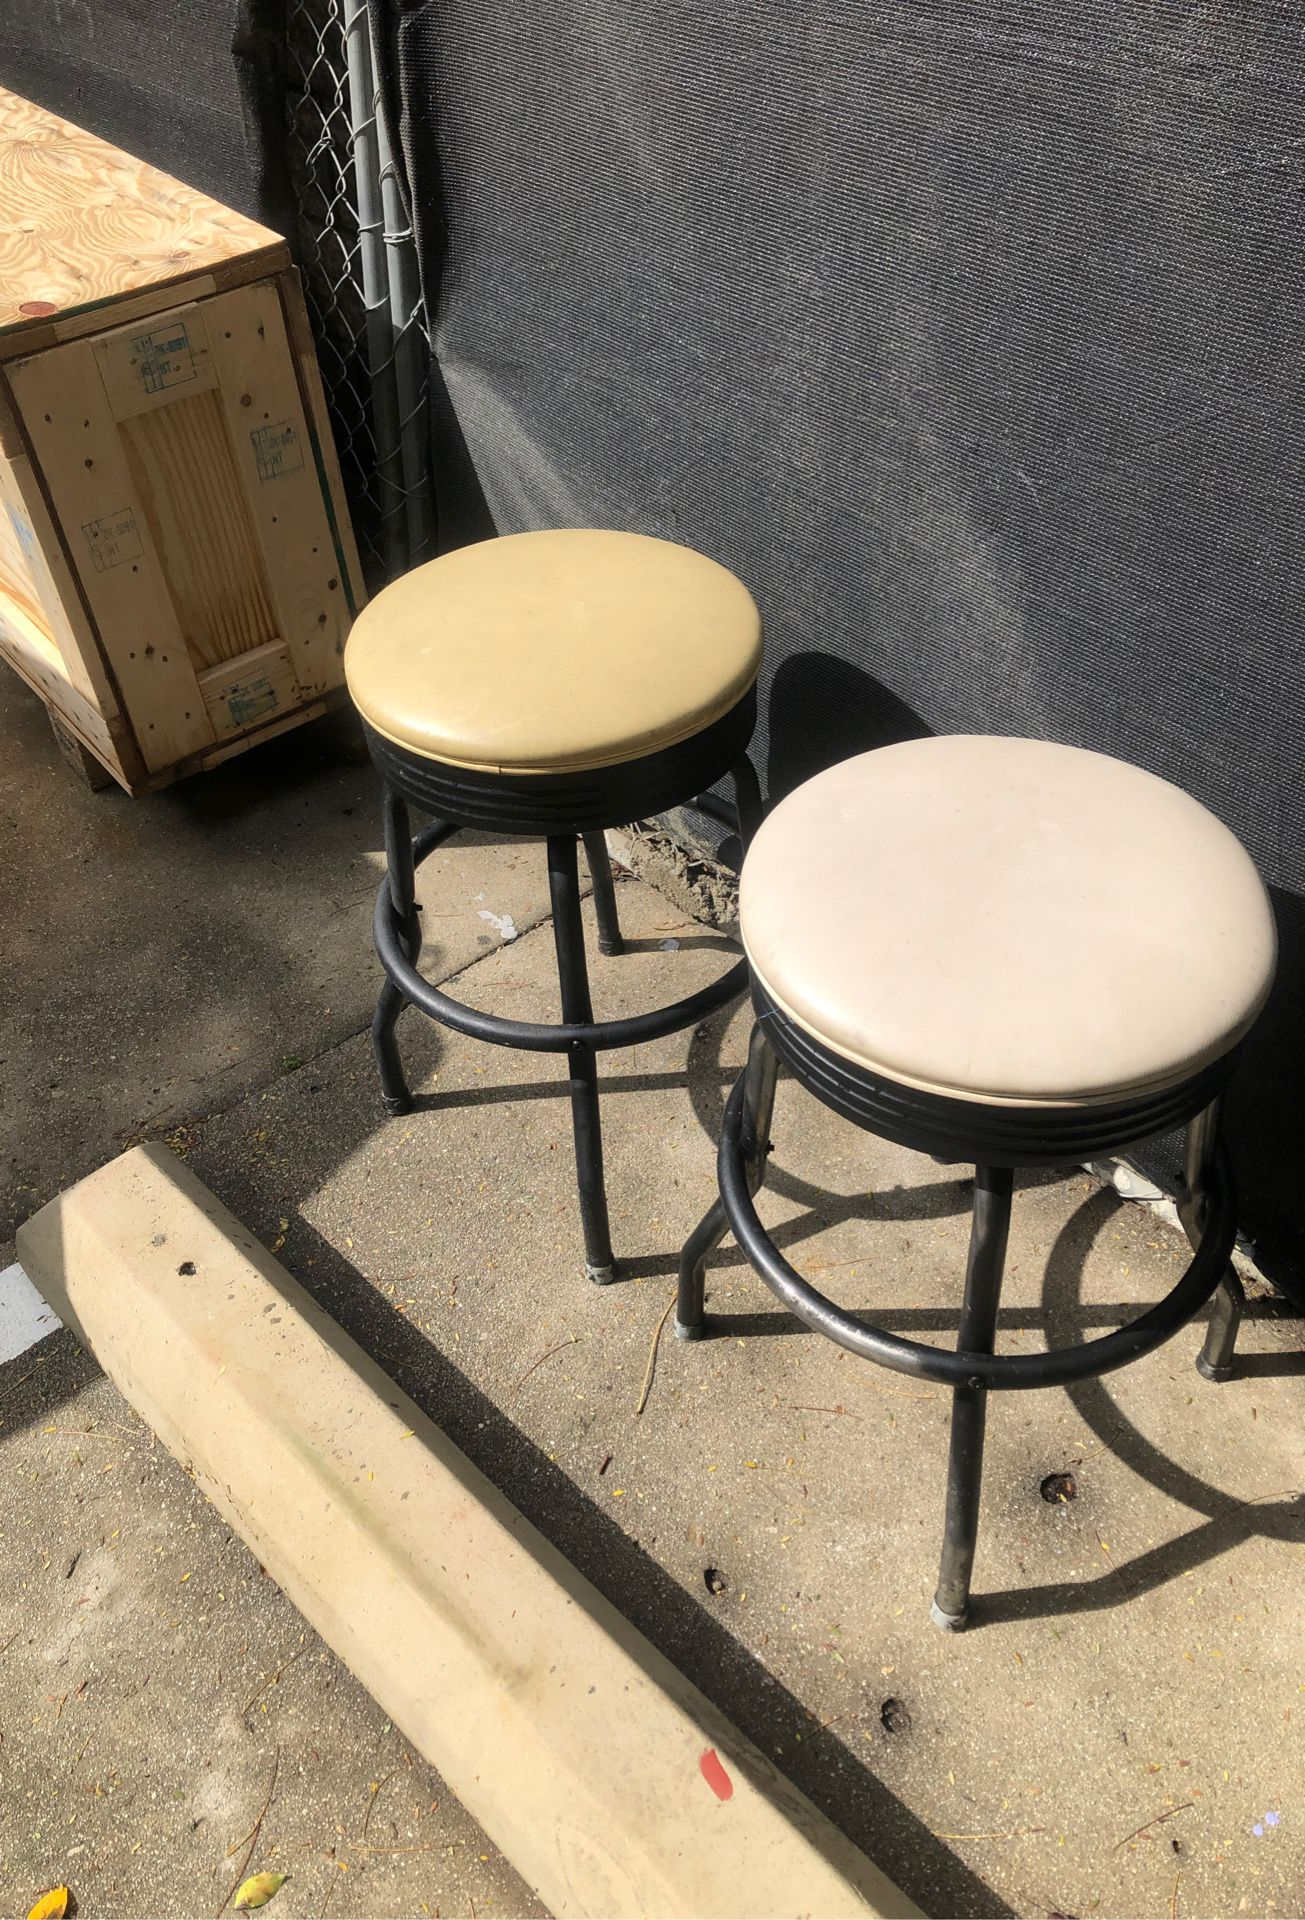 2 Garage stool's LOW, LOW, Iow (2) $25.00 WestHollyWood